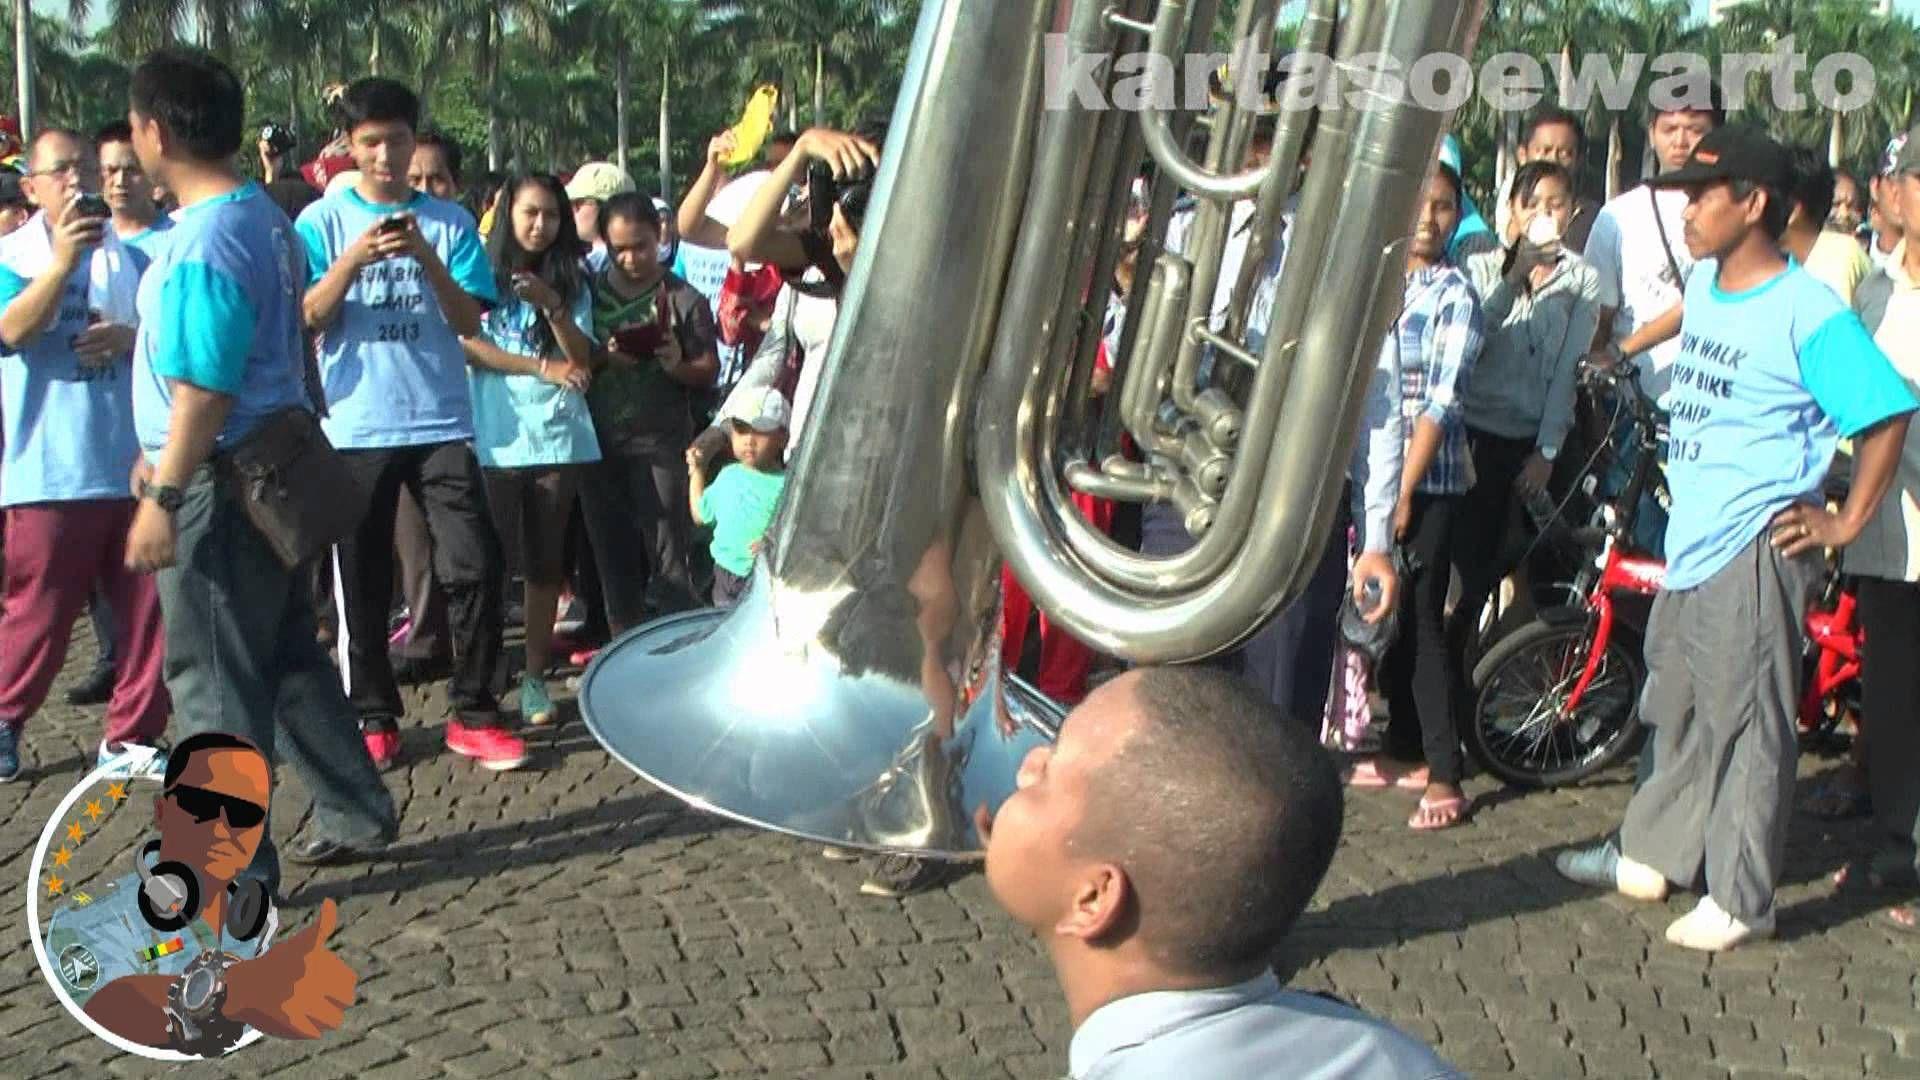 STIP Jakarta Marching Band Monas 2013 PAGI YANG INDAH MENJELANG AKHIR PEKAN PANJANG YANG LEBIH PANJANG TETAP SEMANGAT DAN JAGA STAMINA SELAMAT